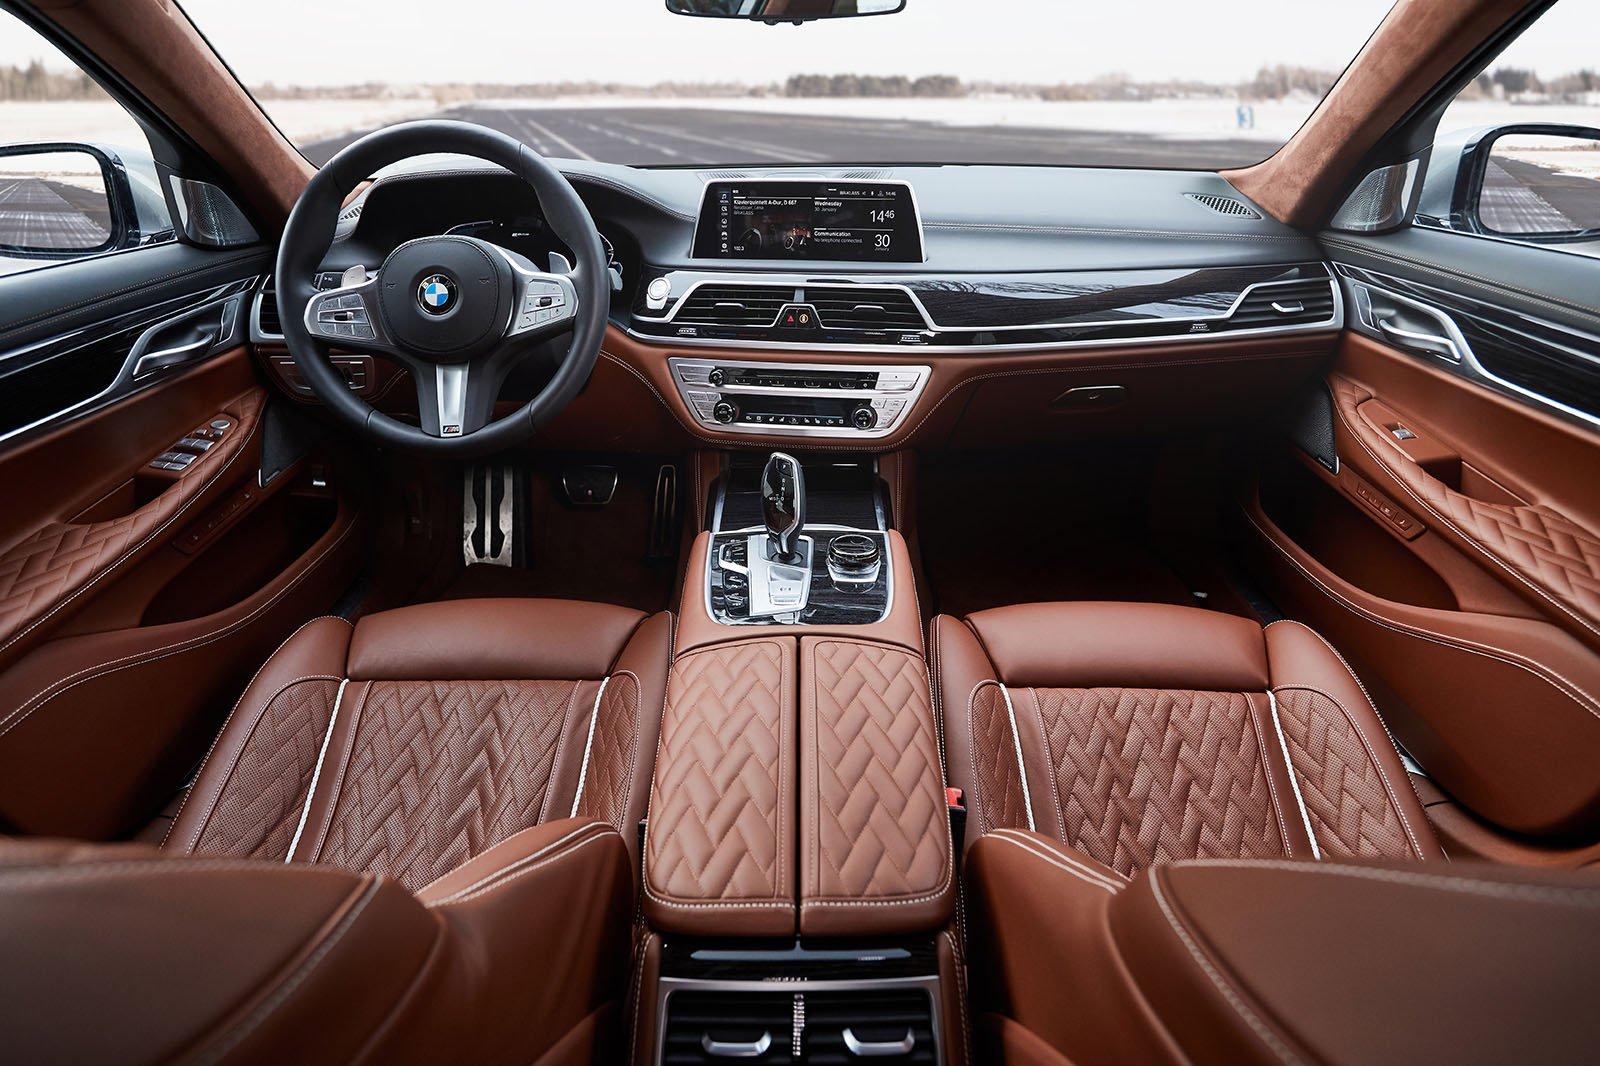 2019 BMW 745e dash